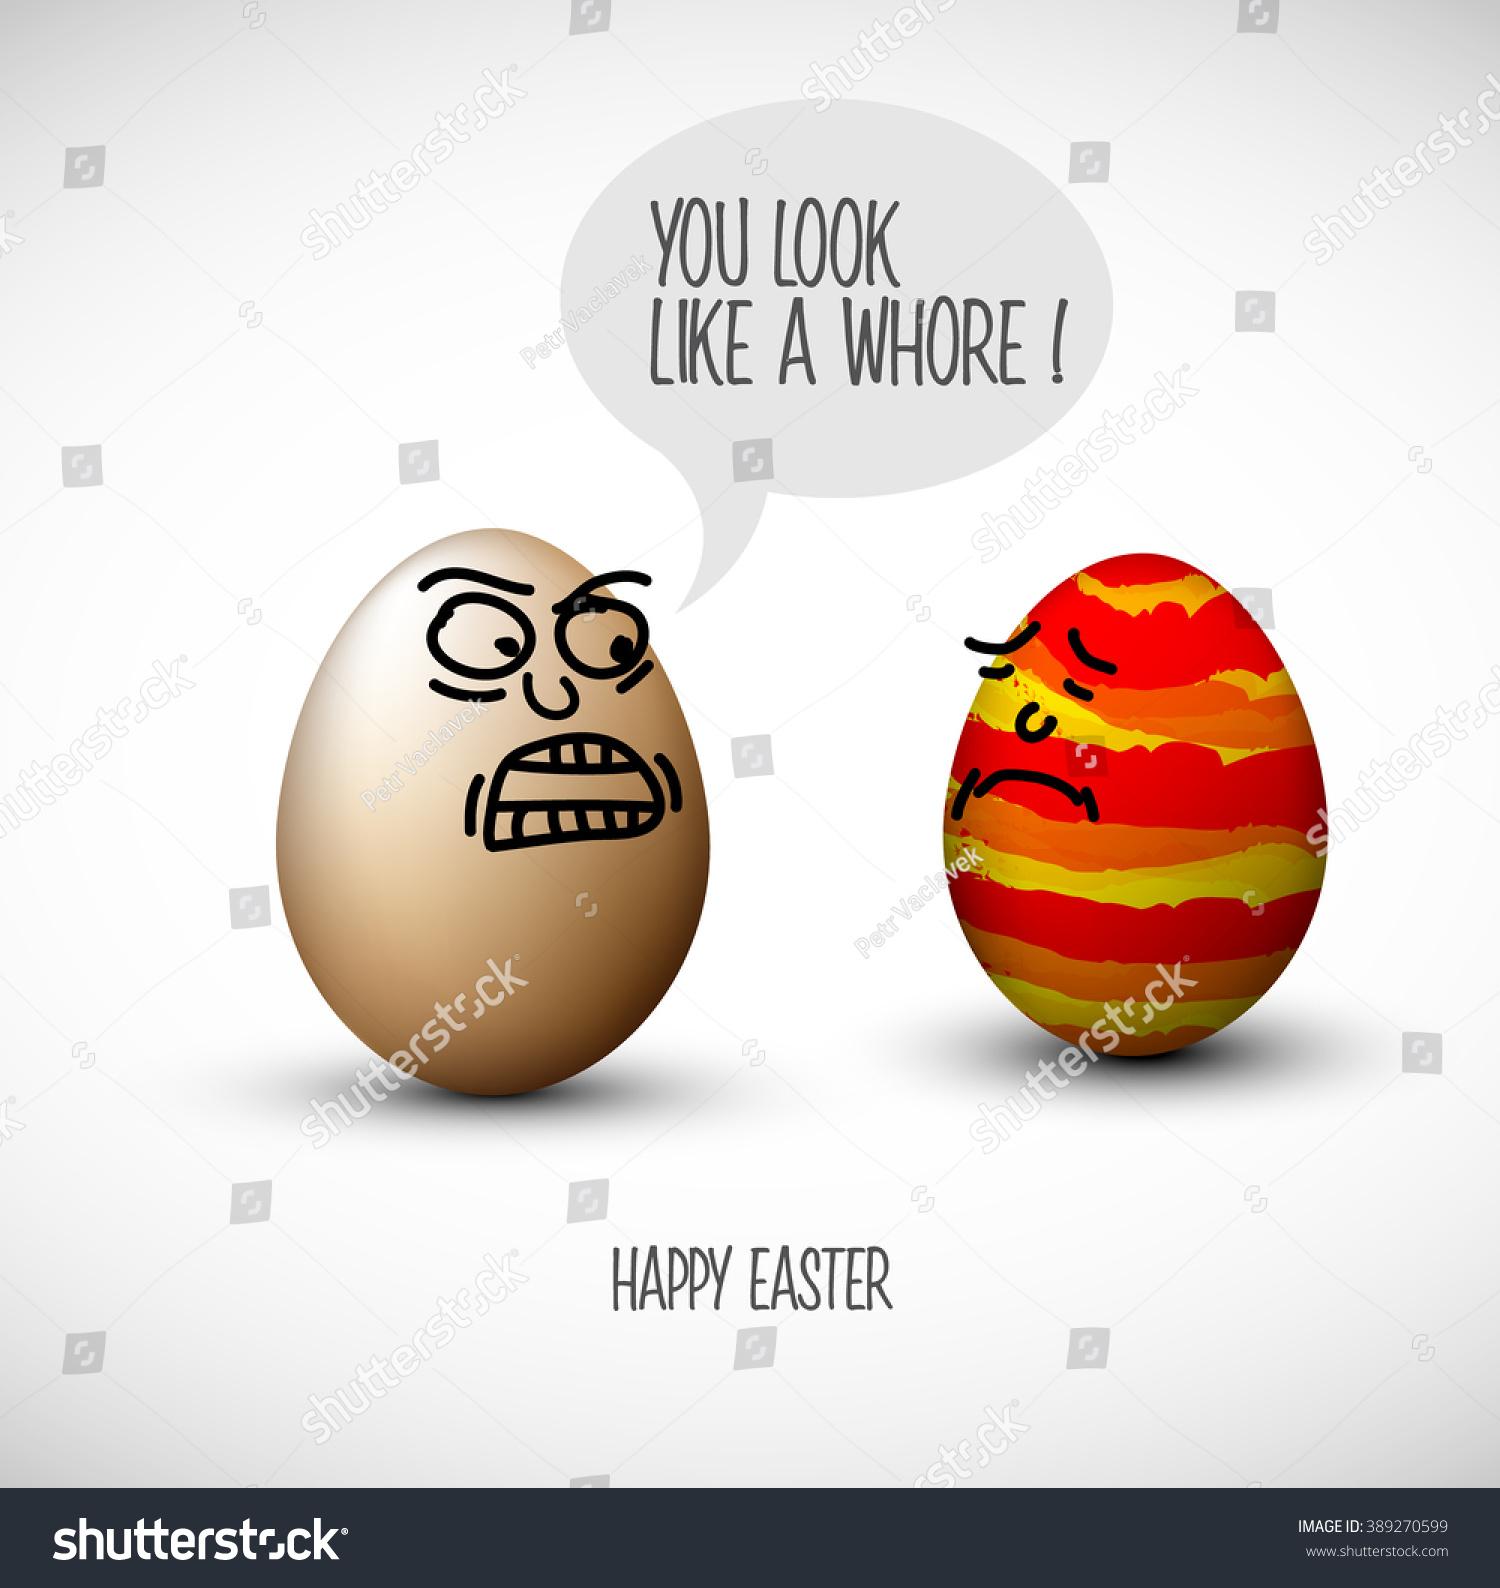 Funny Easter Eggs Speech Bubble Joke Stock Vector ...